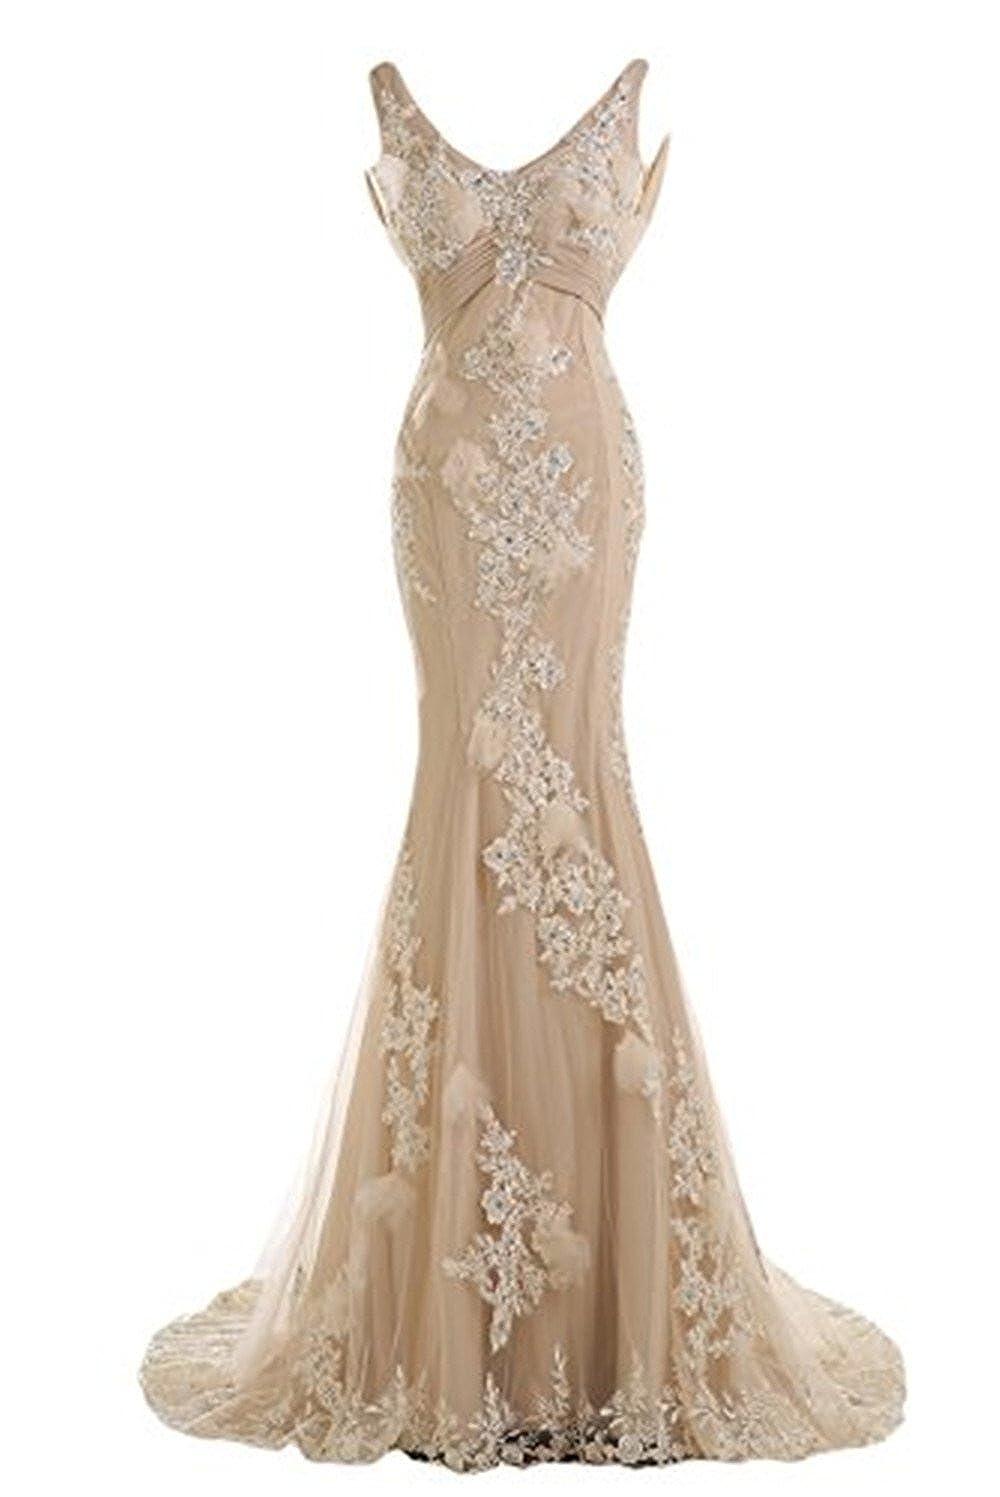 vestido de festa longo Sparkle V Neck Fishtail Evening Dress 2015 vestido de formatura Long Mermaid Backless Prom Dresses at Amazon Womens Clothing store: